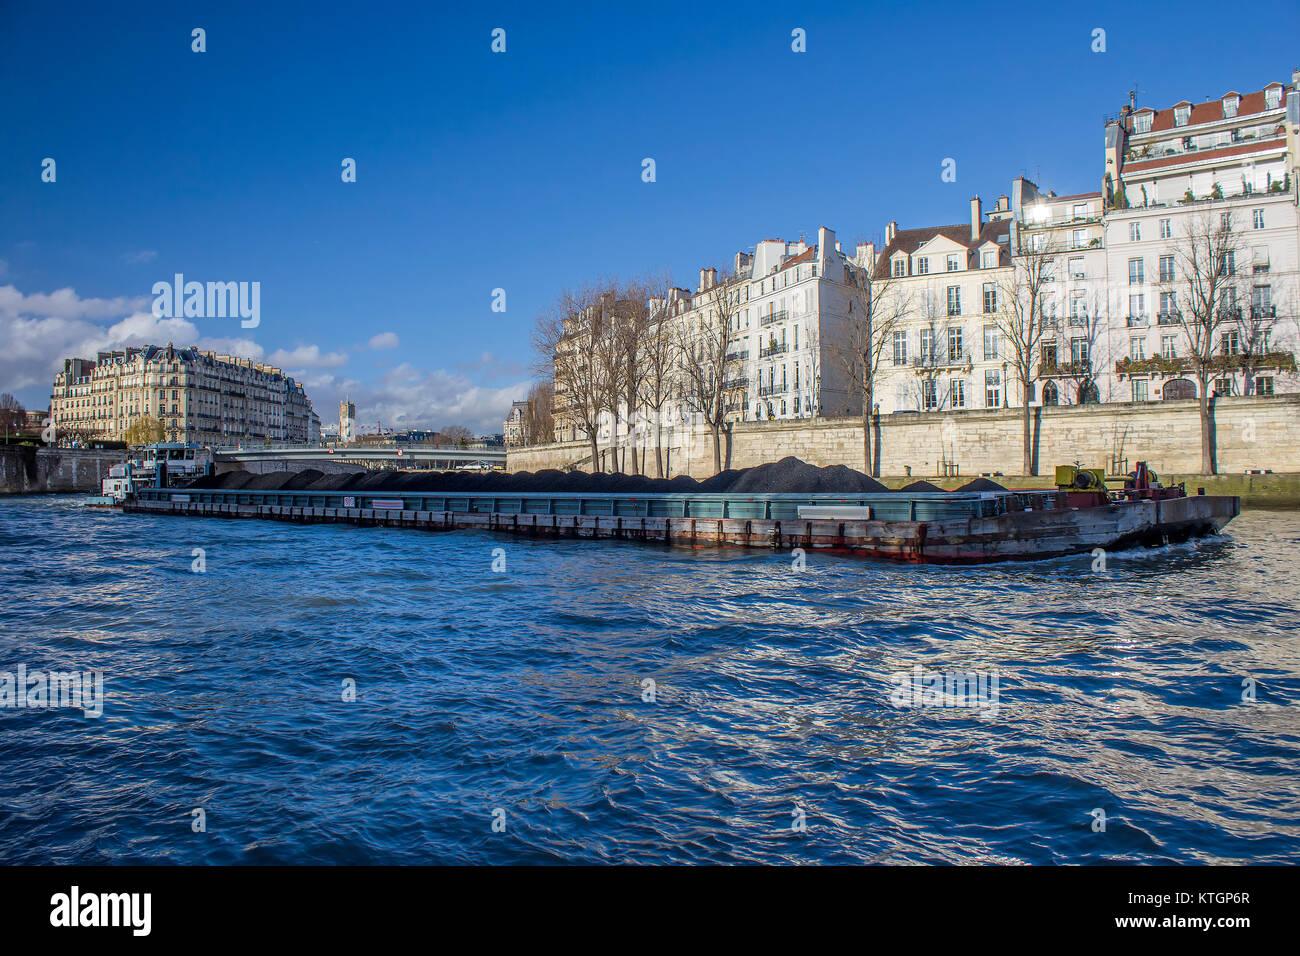 Boat platform on sena river in Paris, france - Stock Image